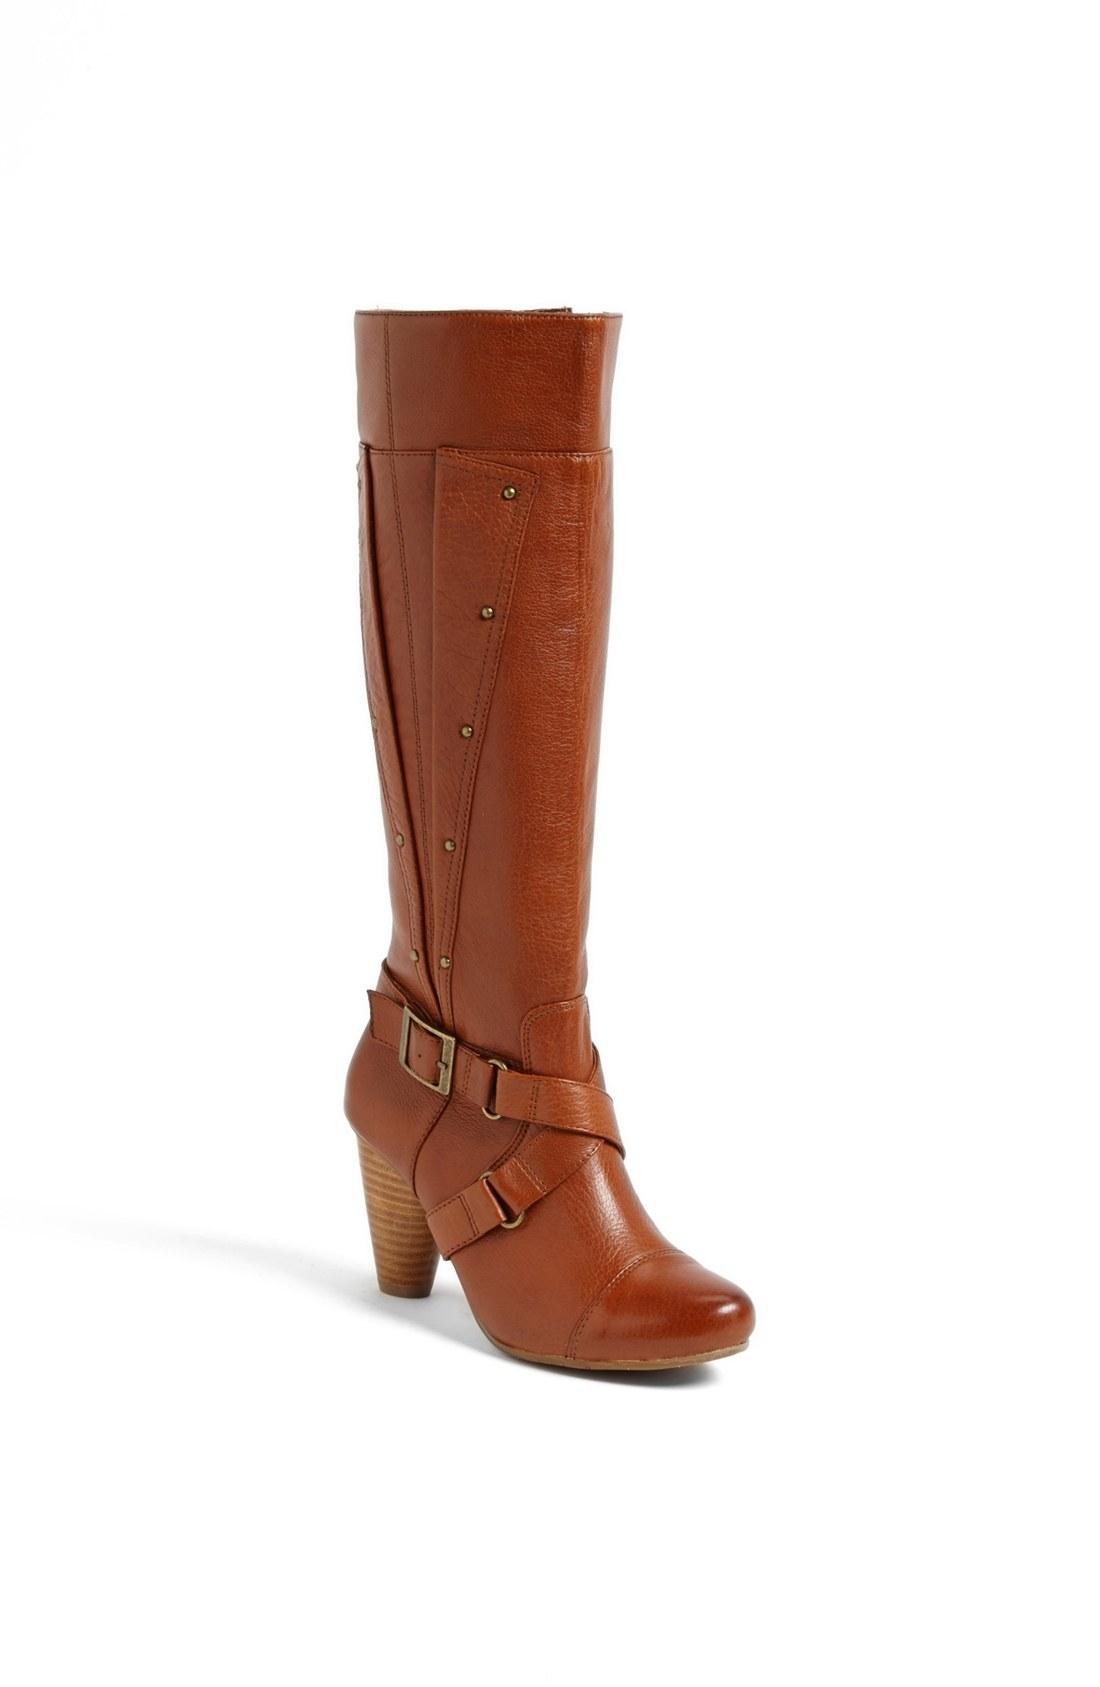 Miz Mooz Jennifer Boot In Brown Whiskey